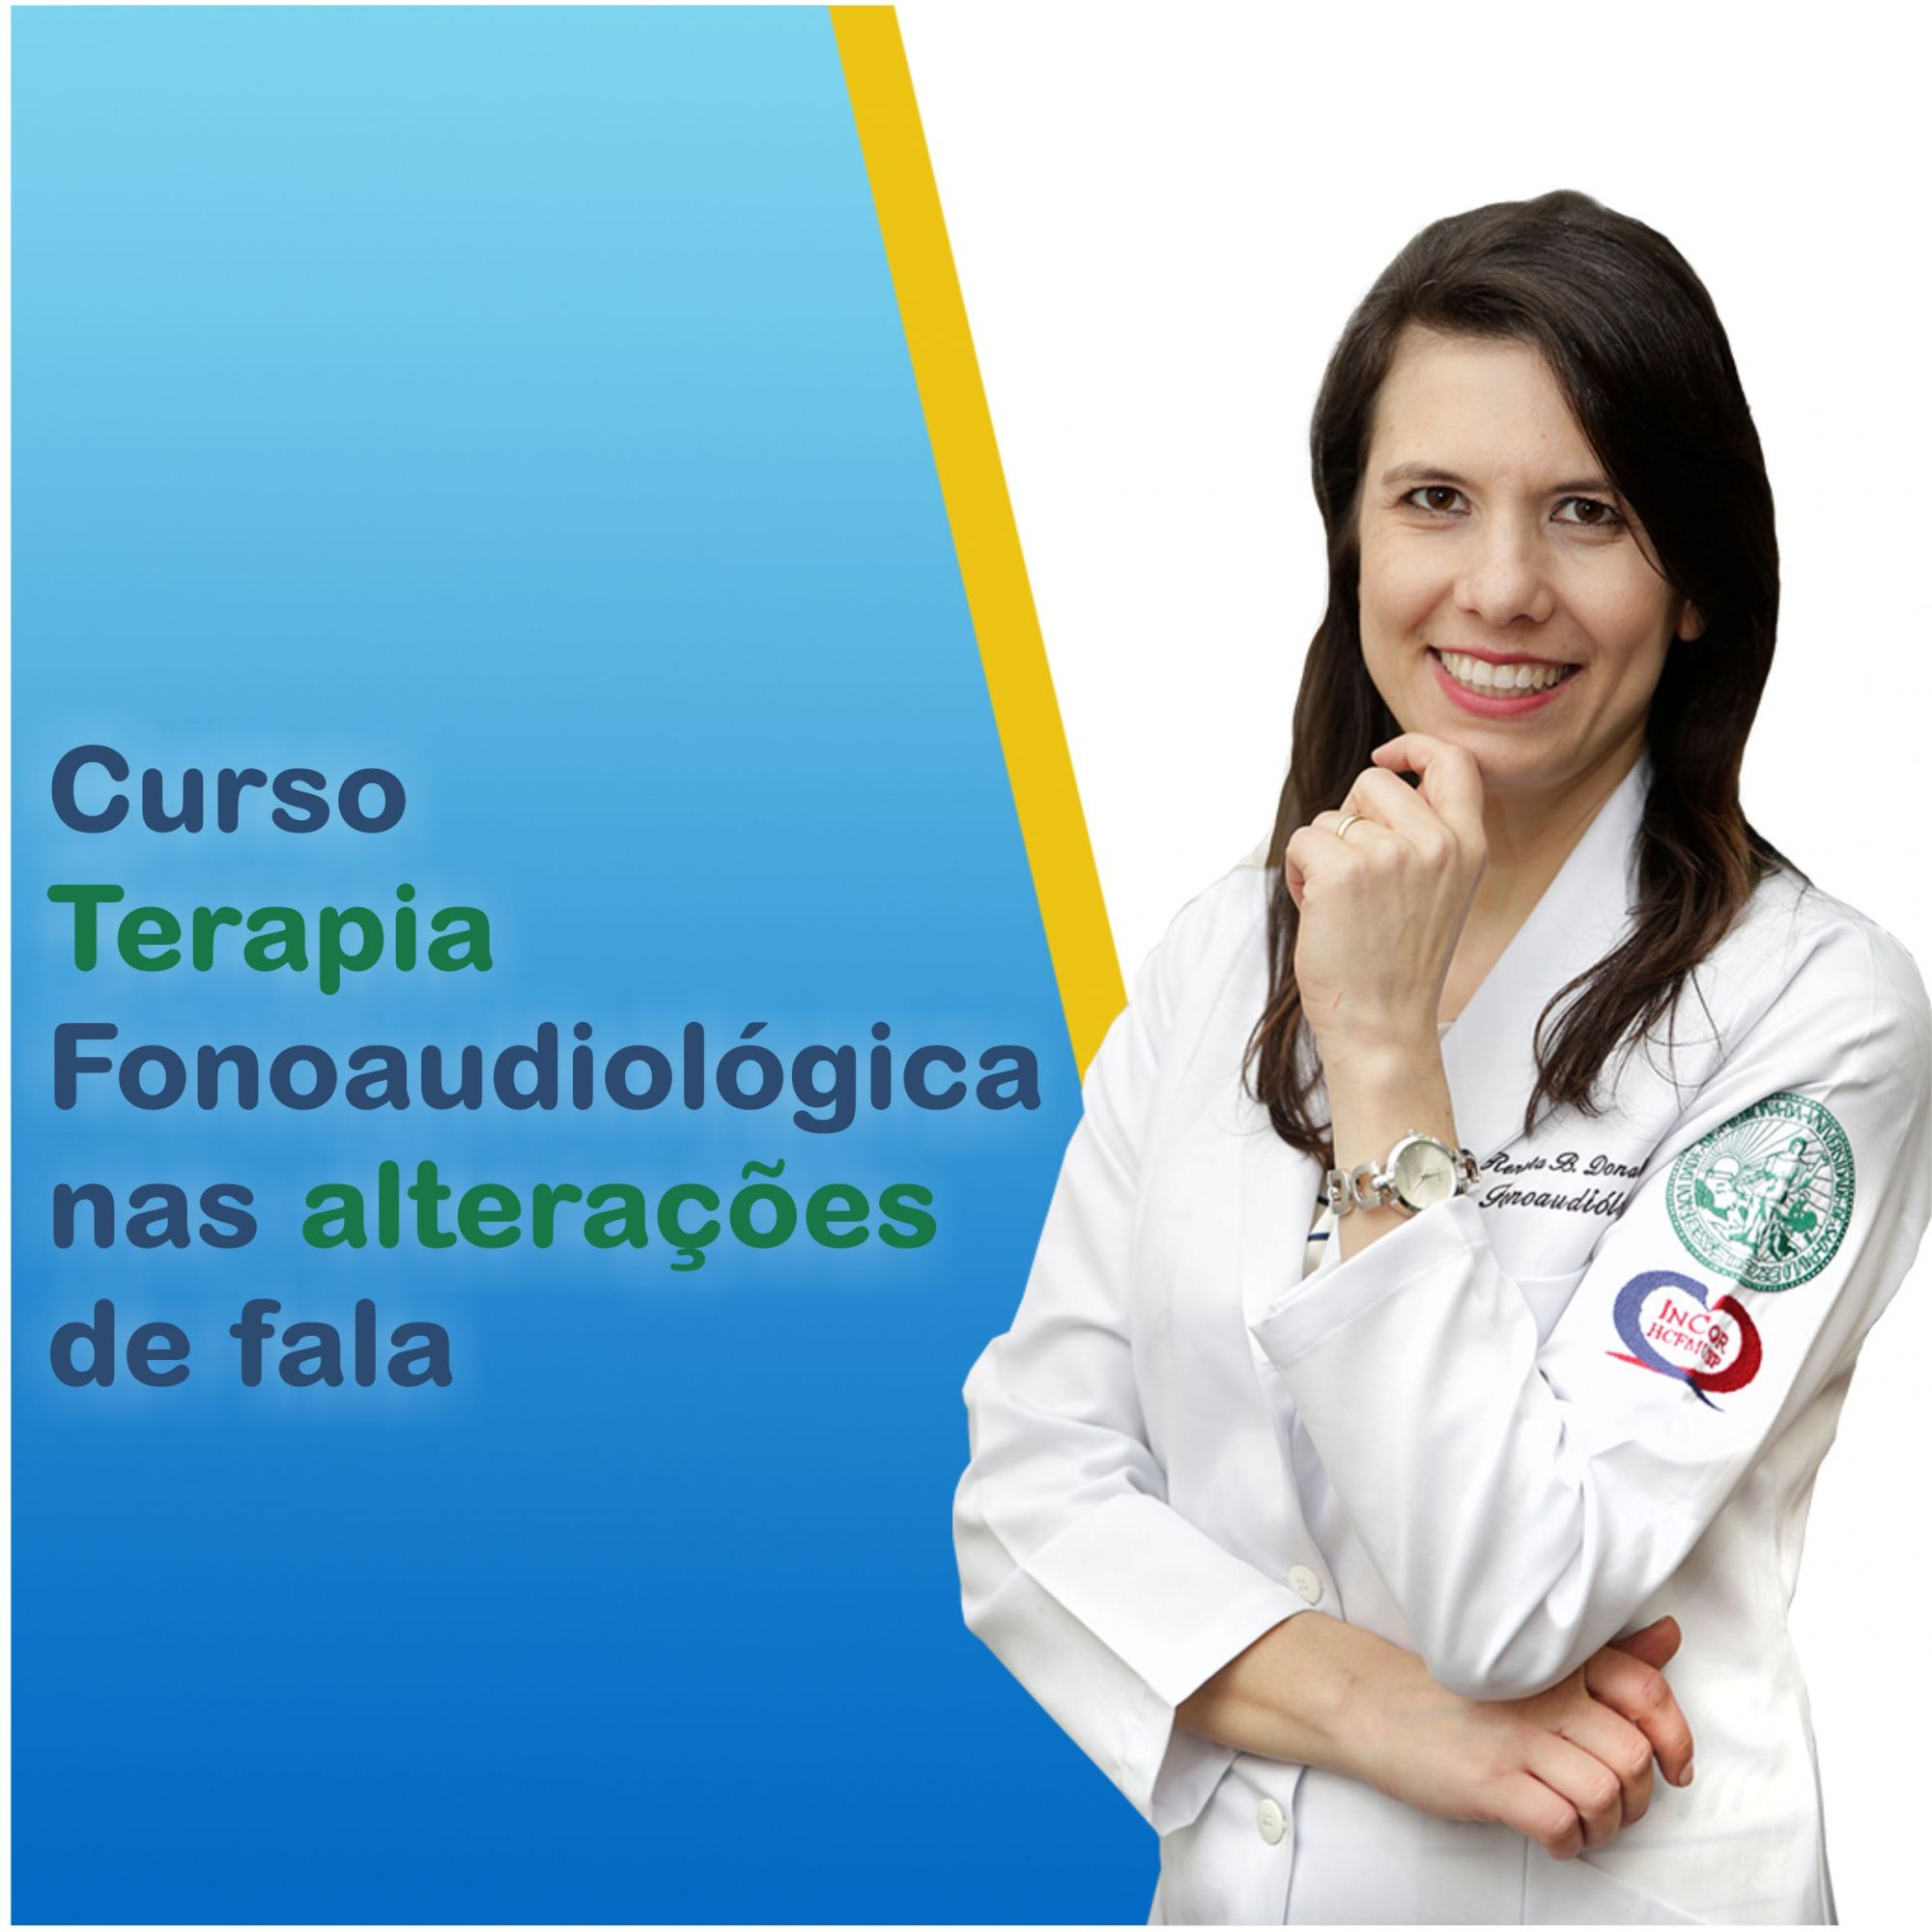 CURSO ONLINE - TERAPIA FONOAUDIOLÓGICA NAS ALTERAÇÕES DE FALA - RENATA DONADELI